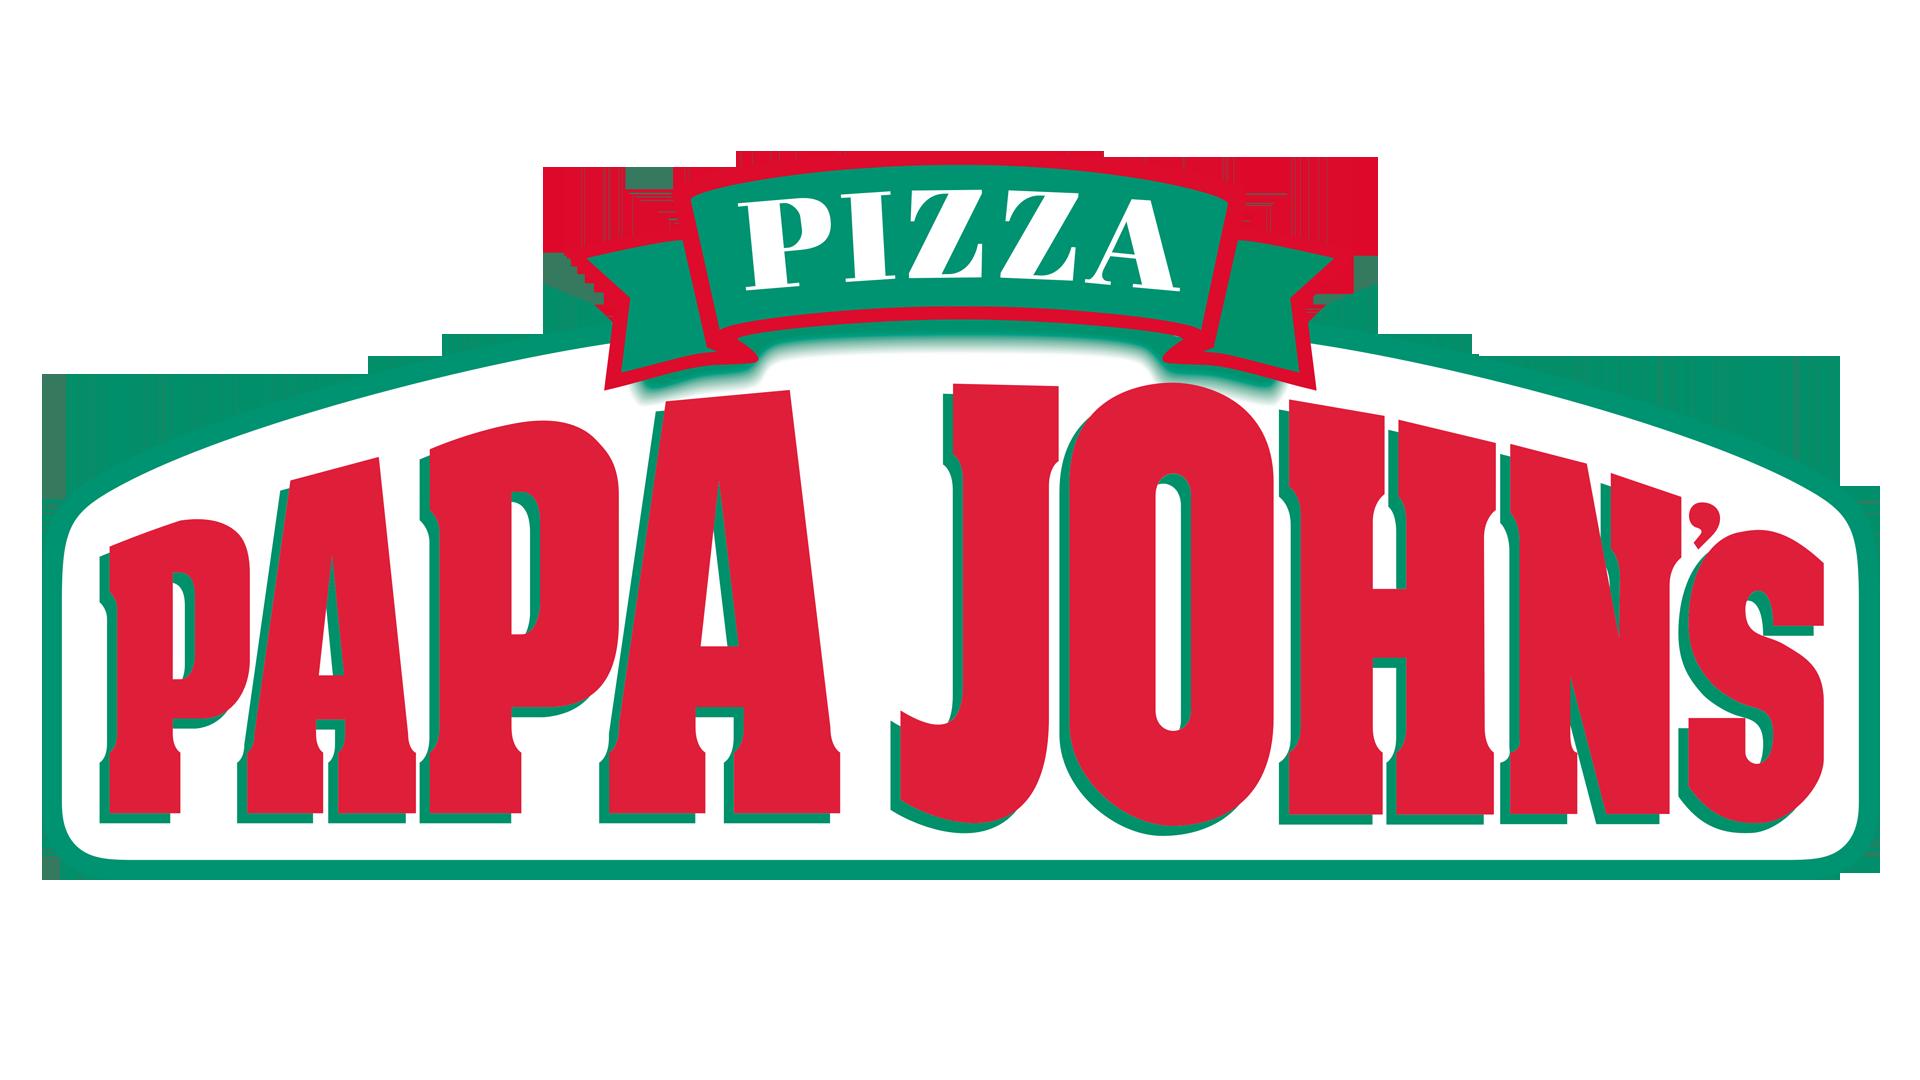 Meaning Papa Johns logo and symbol.